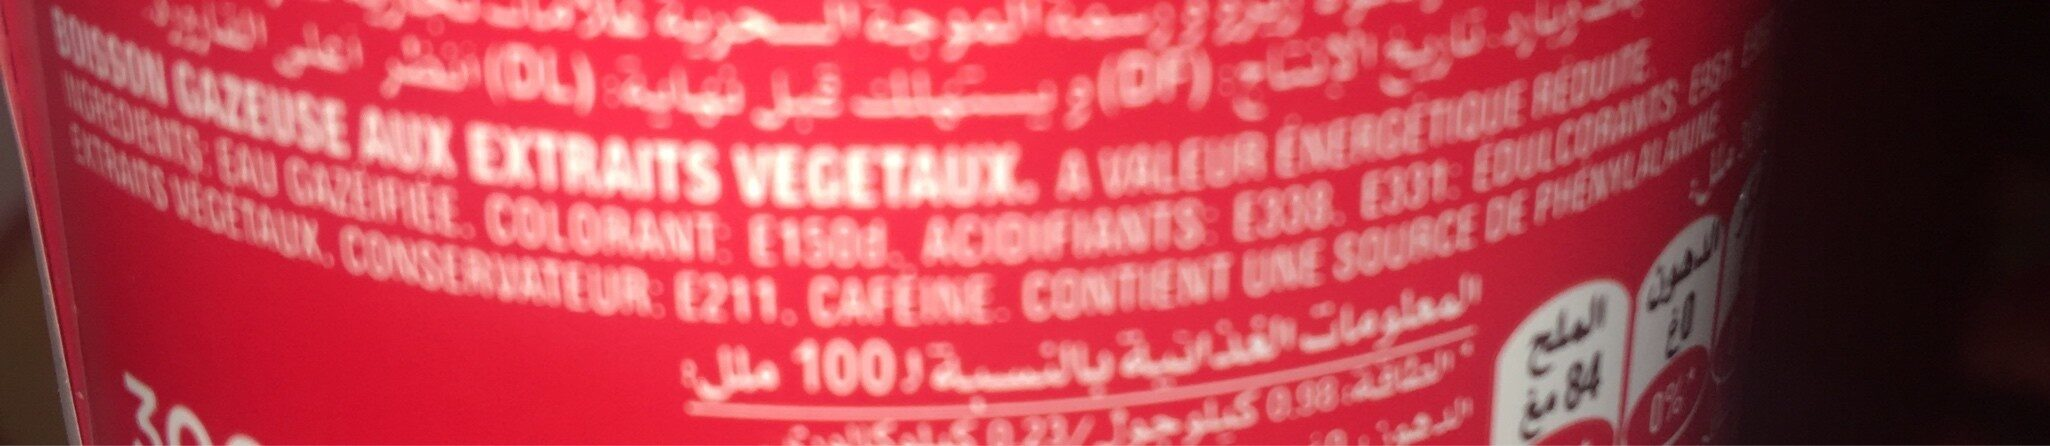 Coca cola zero - Ingrédients - fr